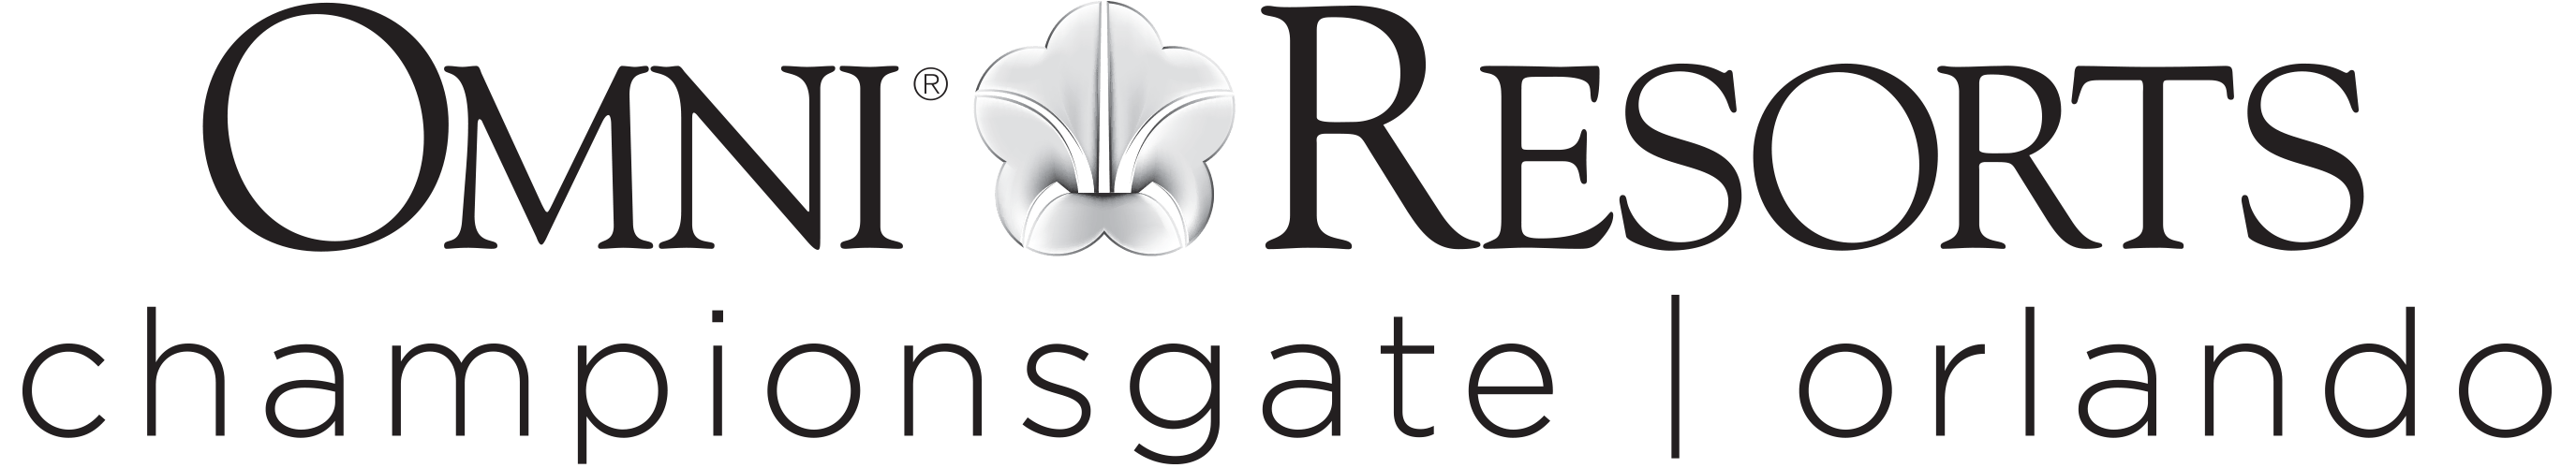 Omni Orlando at Championsgate Groups's Logo